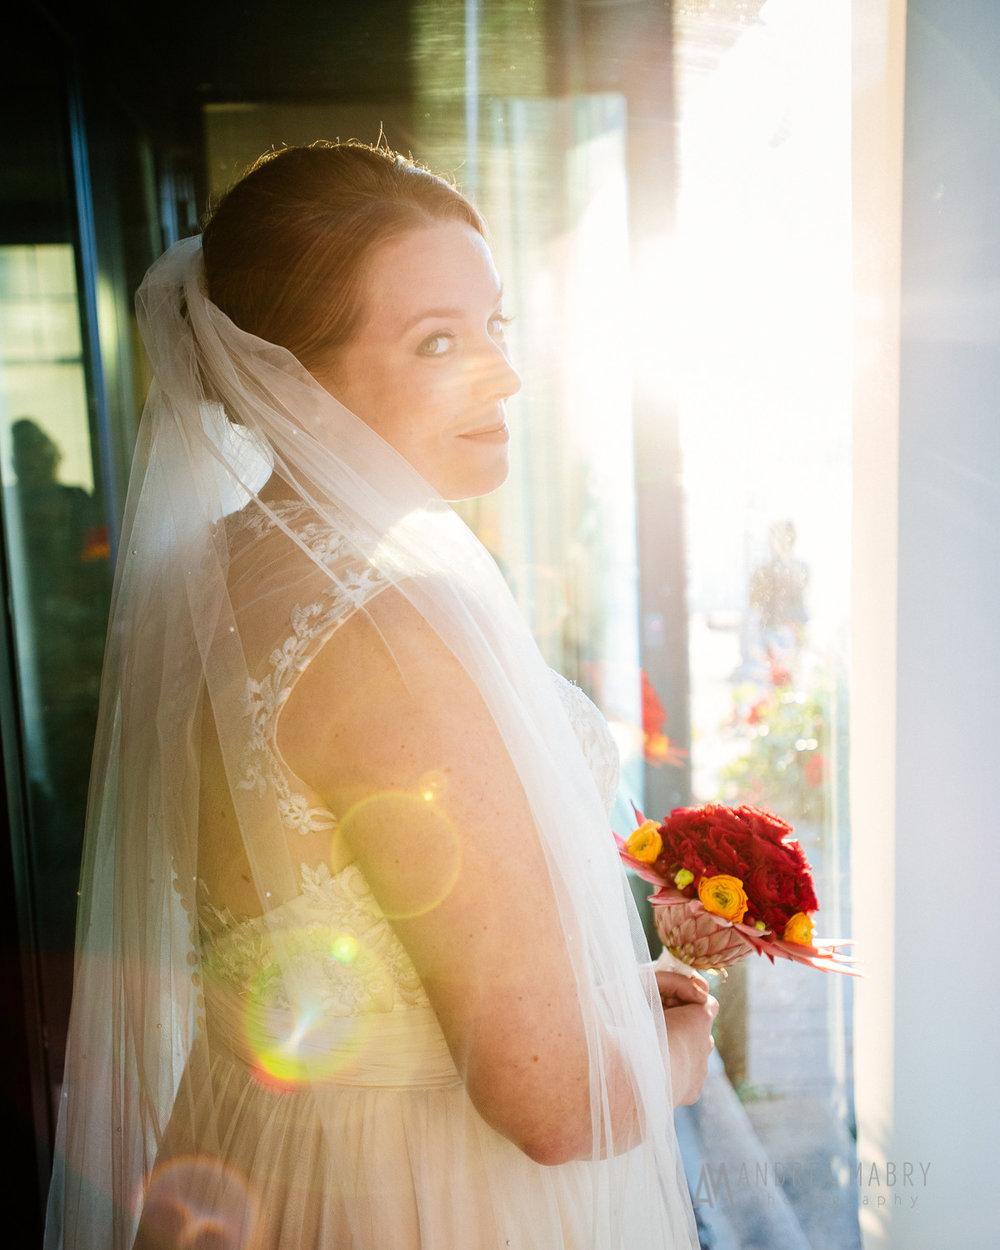 20171028-sarahmiller-wed-blog-045-5019.jpg